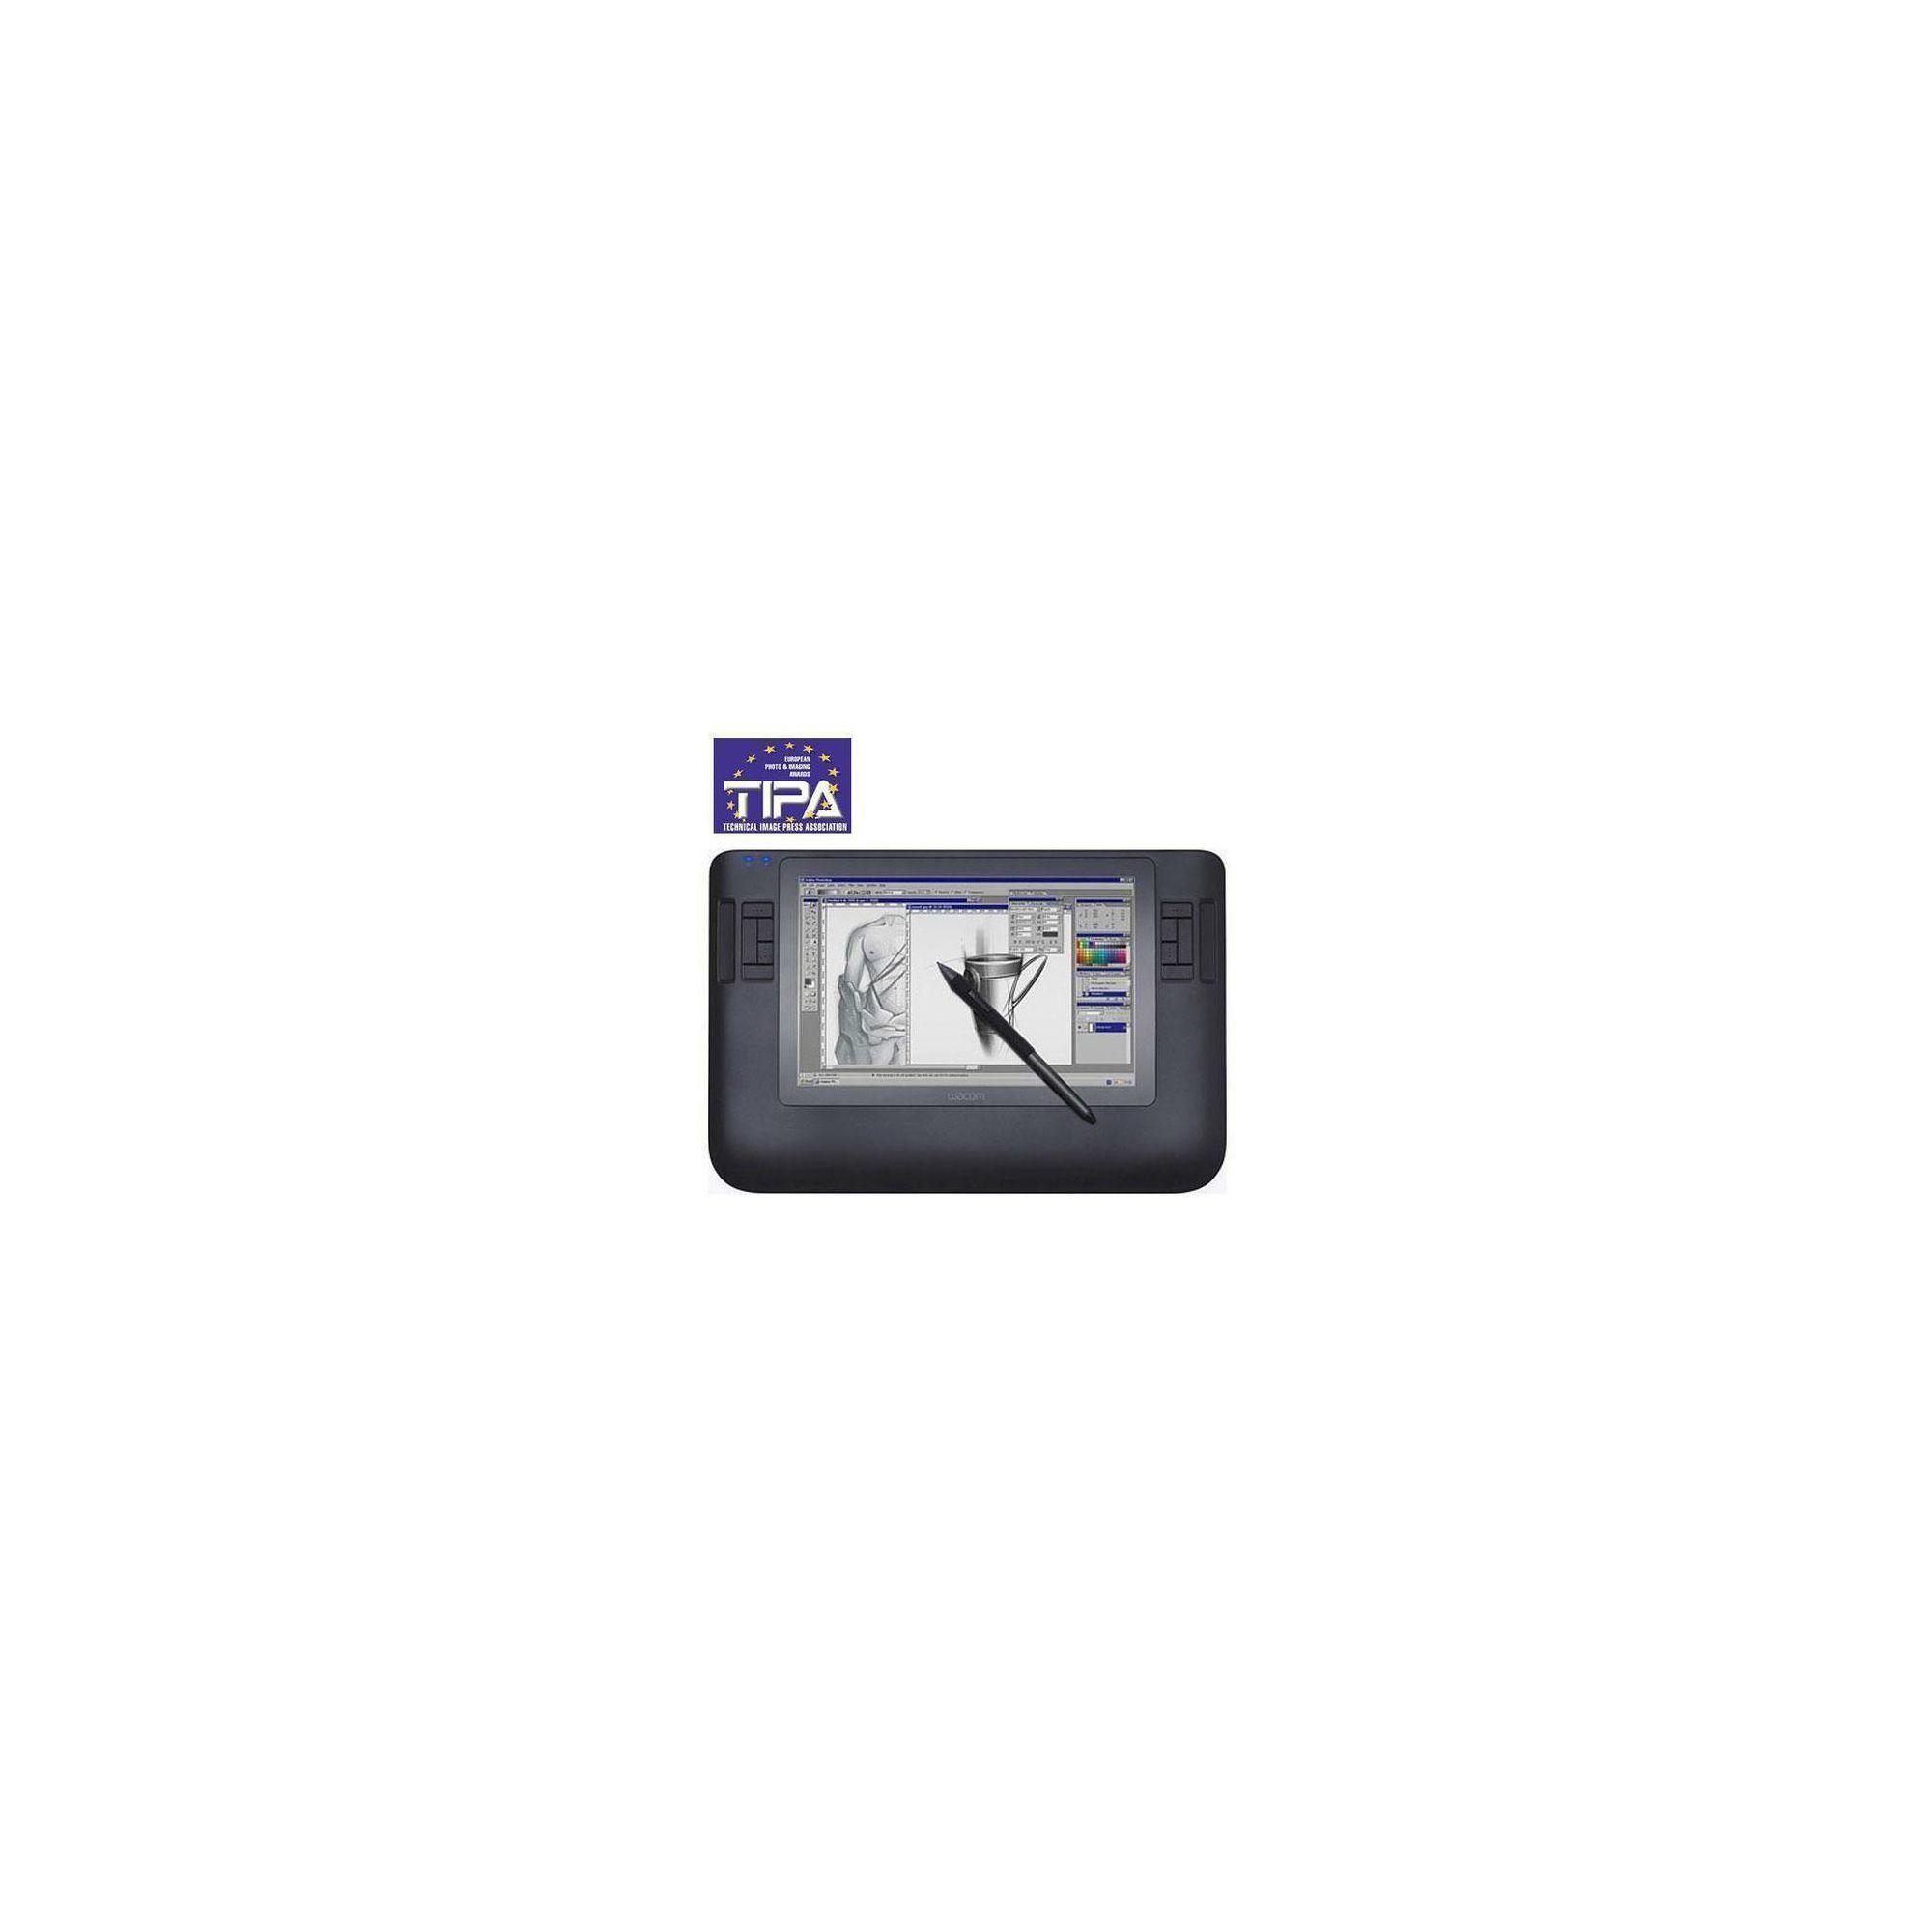 Wacom Technology WAC-DTZ1200W-FR Cintiq 12WX LCT Tablet at Tesco Direct